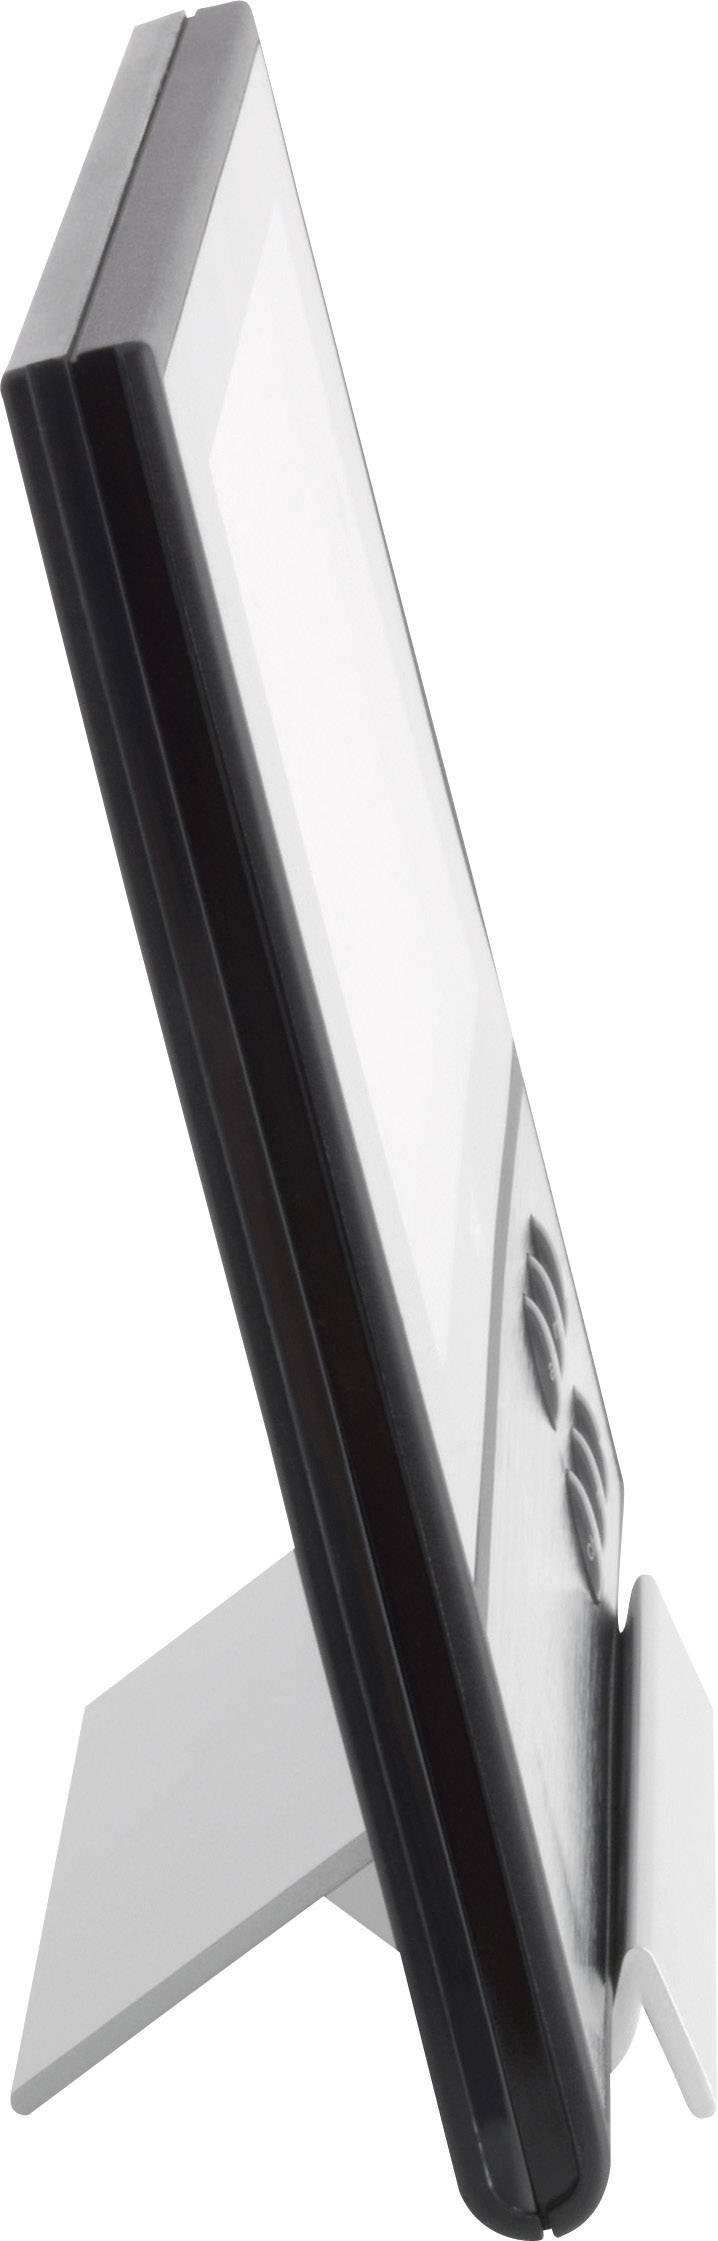 Bezdrôtová meteostanica TFA PURE Design NRG 2